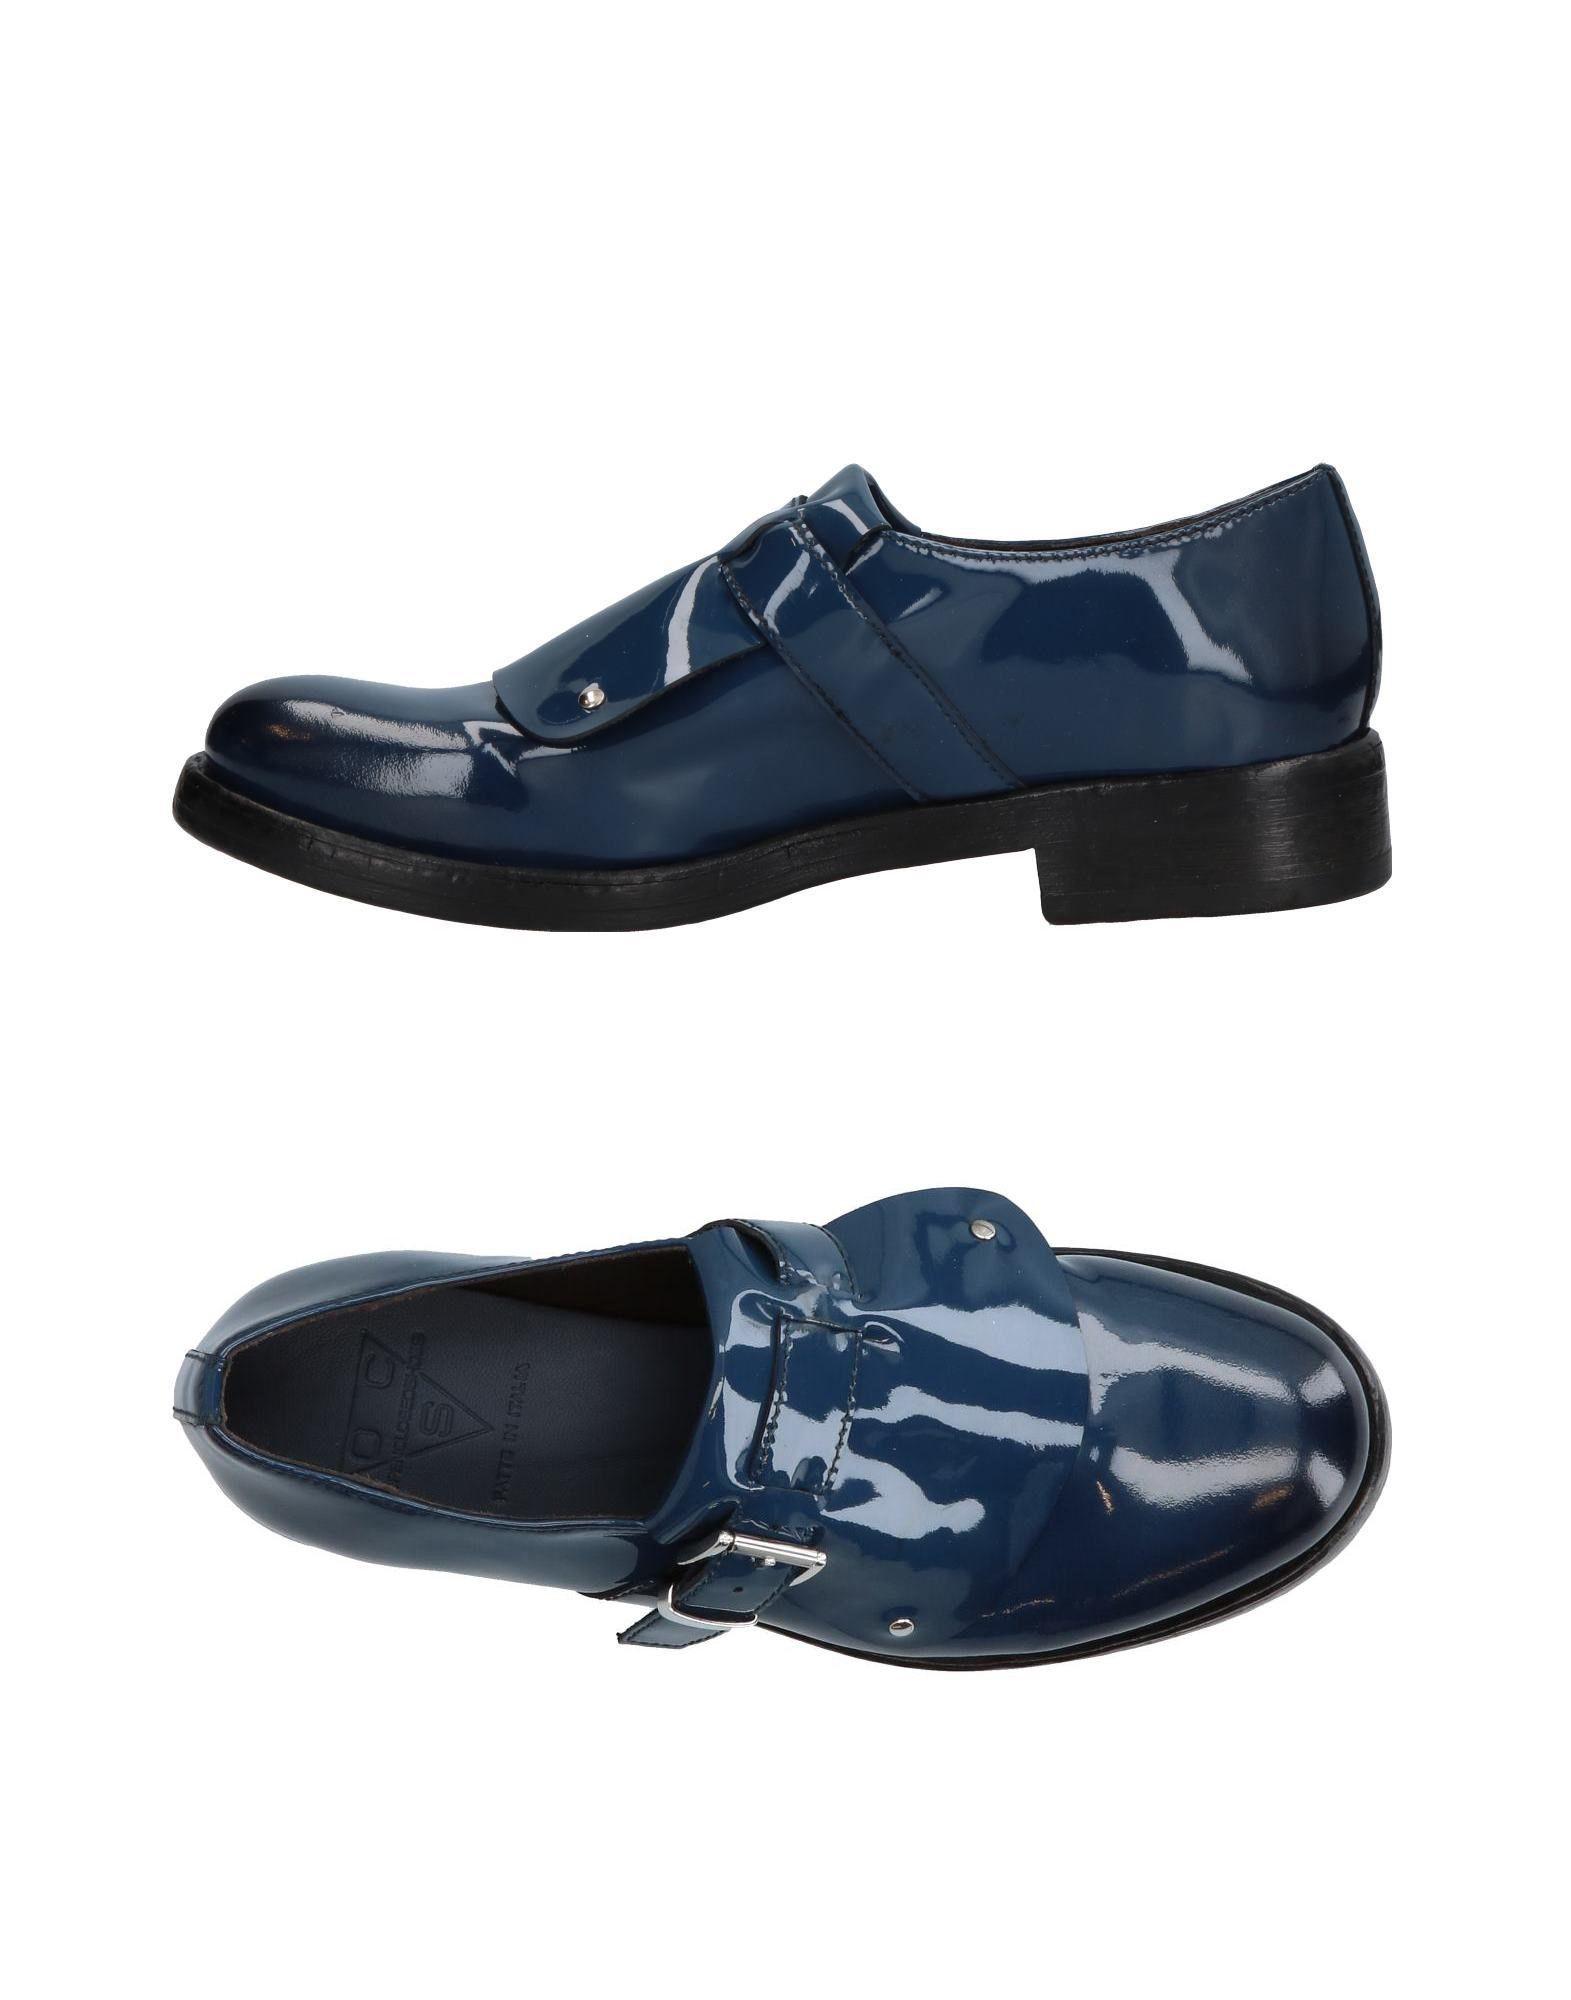 Venta de de liquidación de de temporada Mocasín Op Closed  Shoes Mujer - Mocasines Op Closed  Shoes  Negro 73e03d